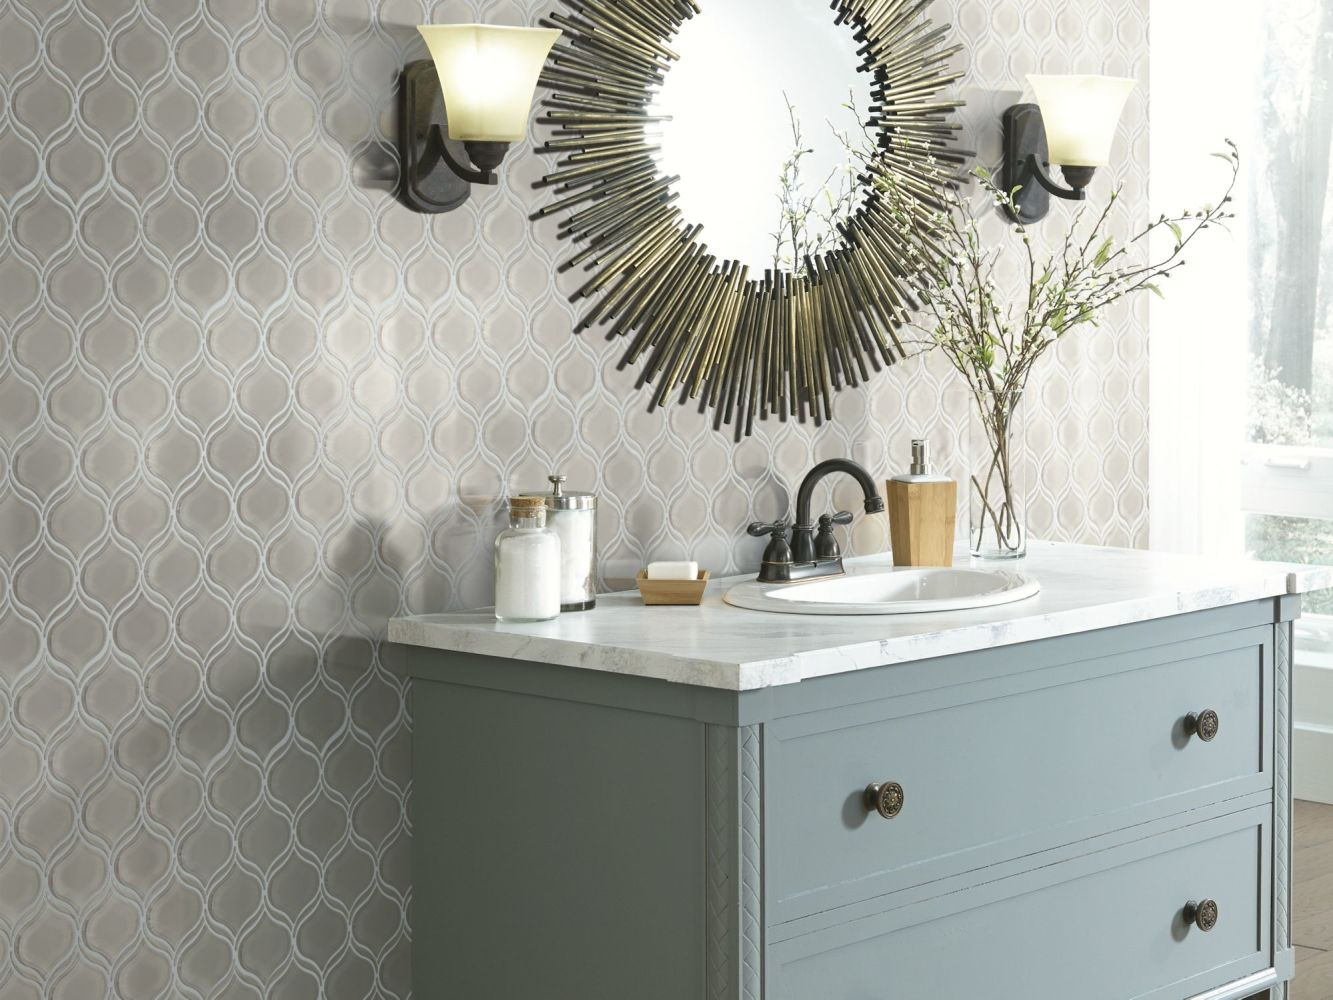 Shaw Floors Home Fn Gold Ceramic Principal Lantern Glass Mosaic Mist 00250_TG80B